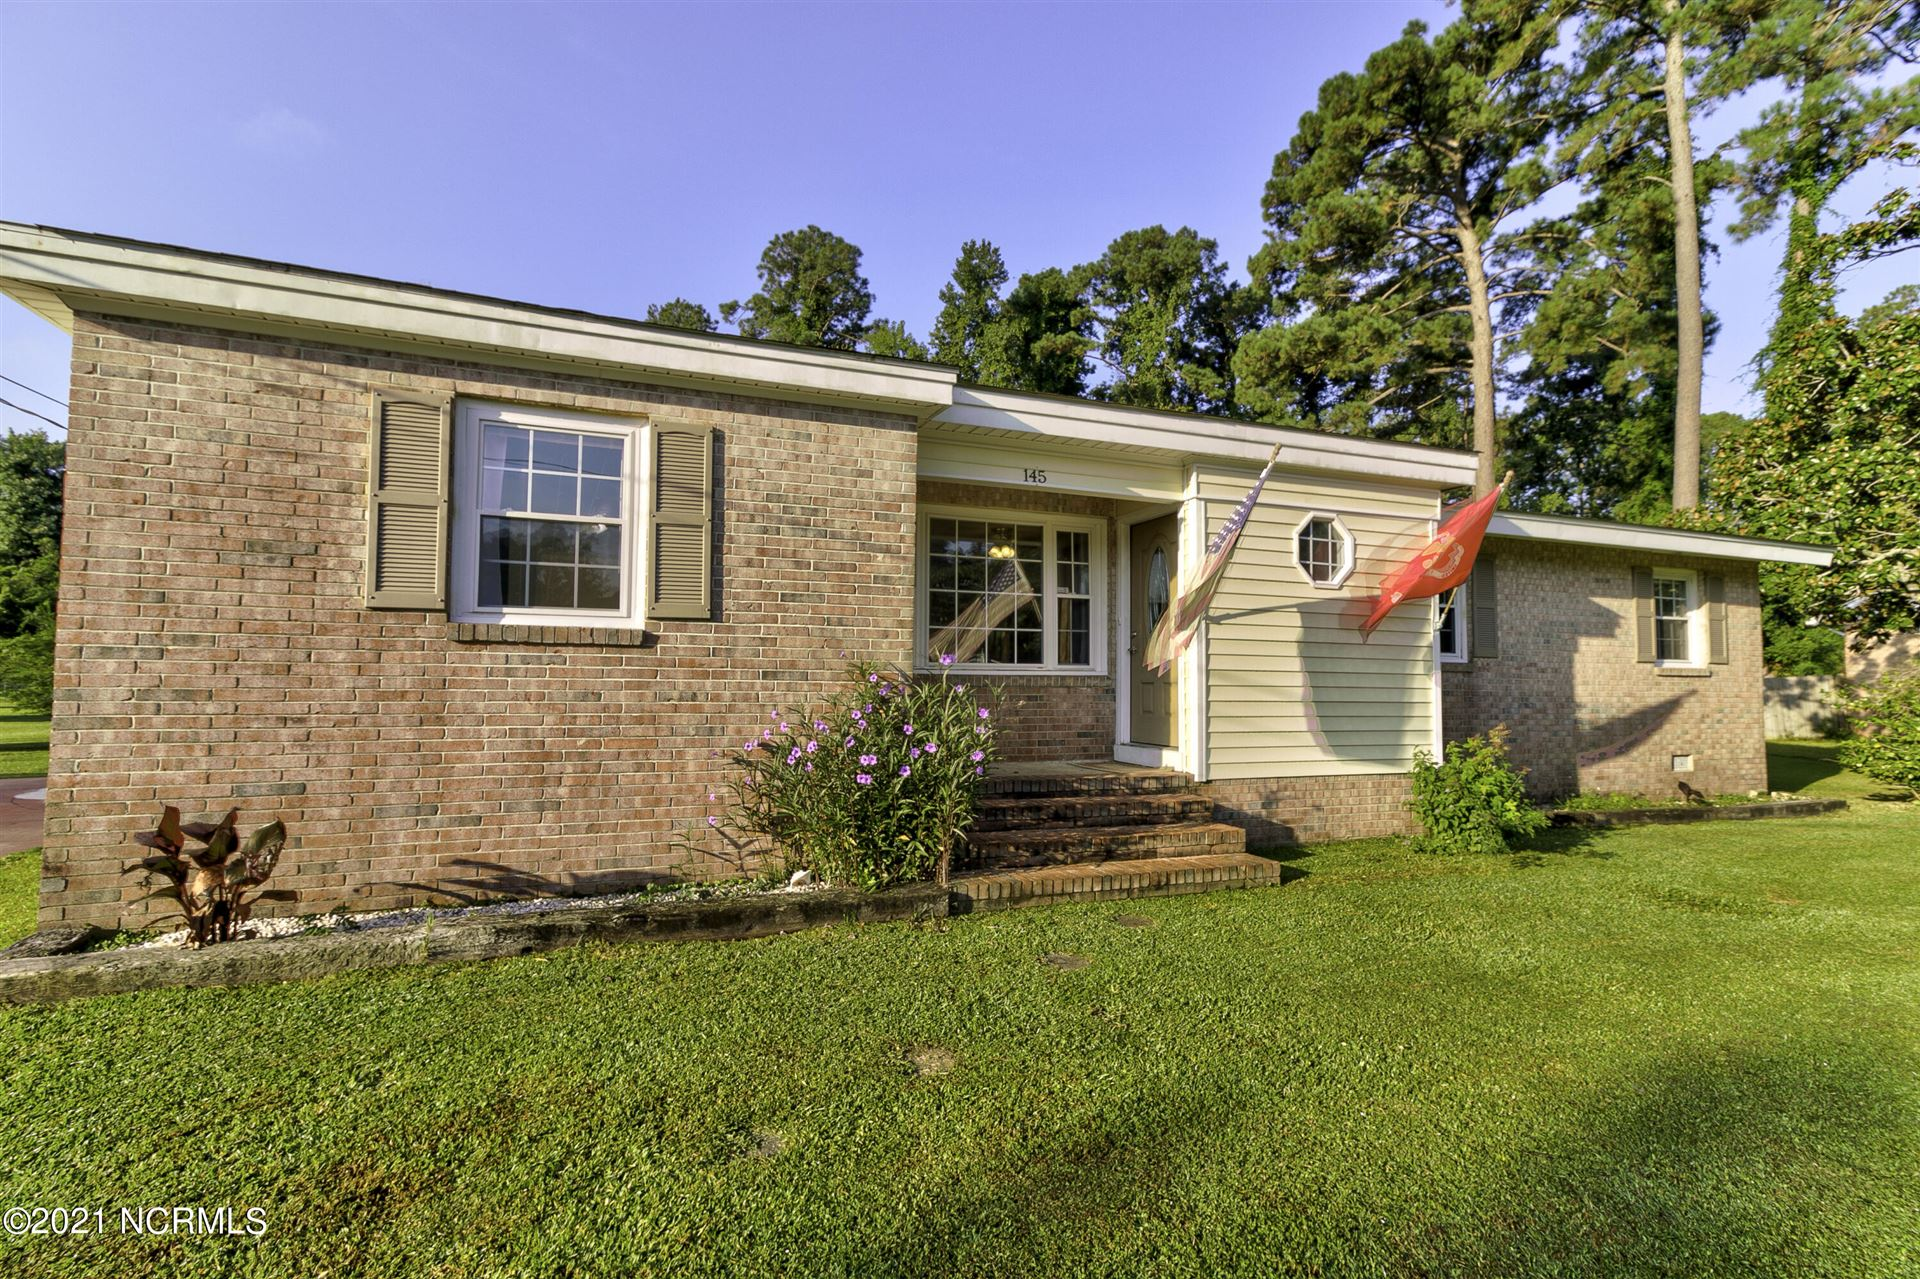 Photo of 145 Woodland Drive, Havelock, NC 28532 (MLS # 100291552)